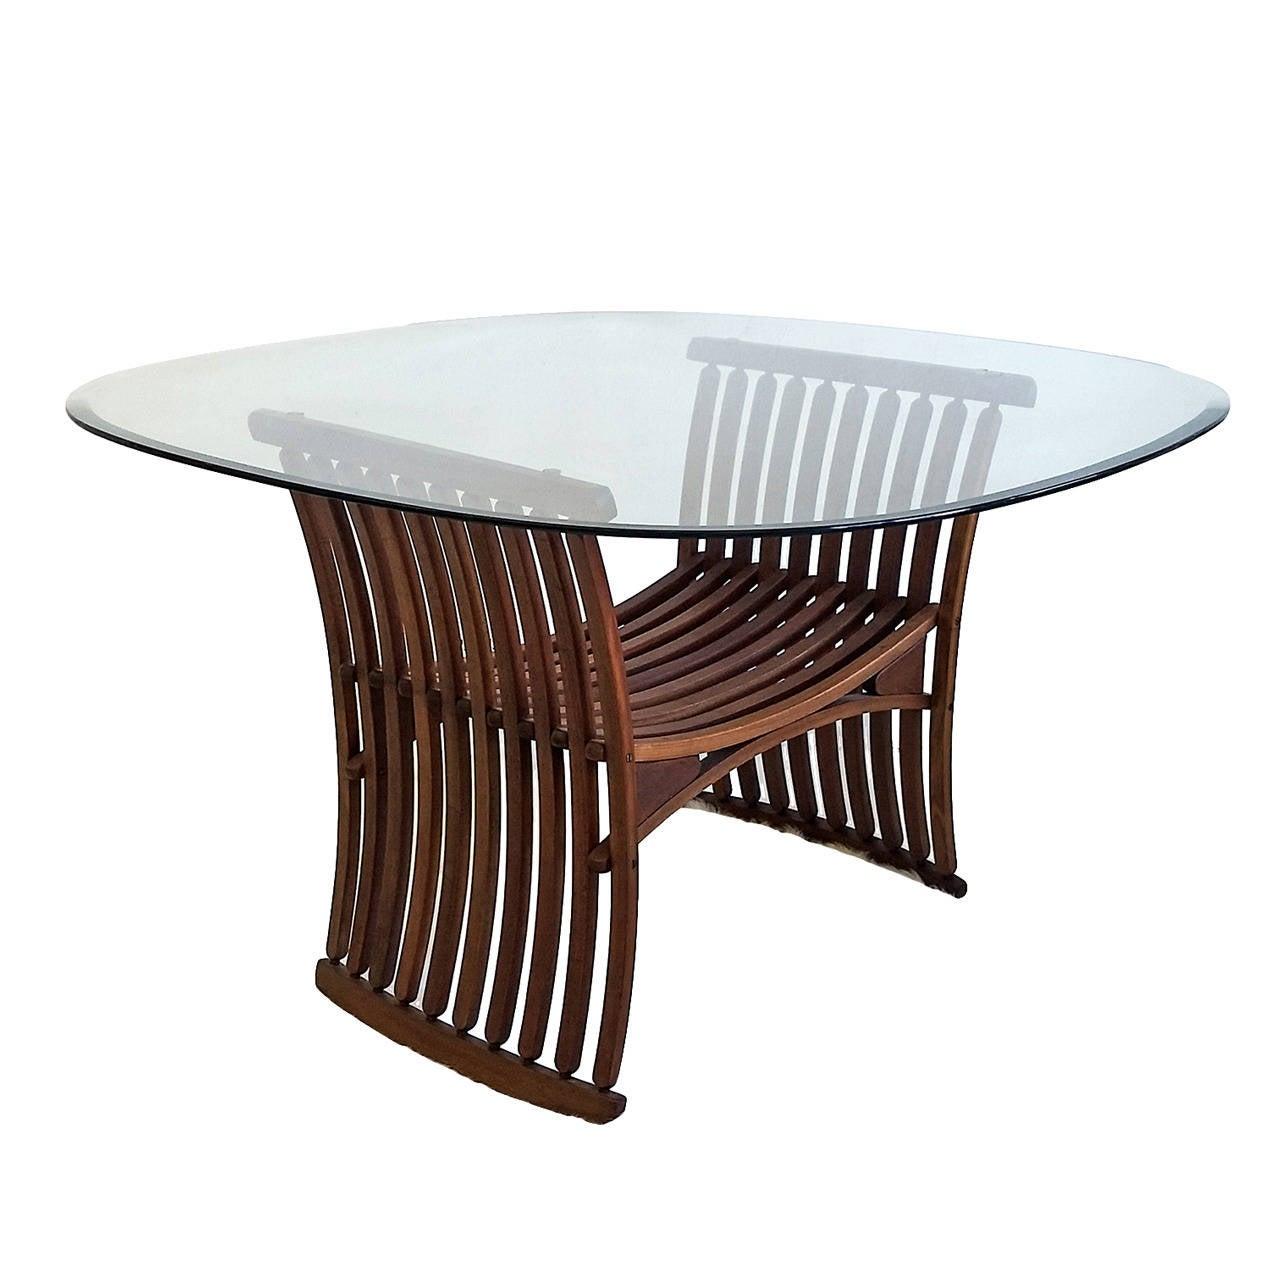 Danish Modern Slatted Rib Bone Teak Dining Table At 1stdibs